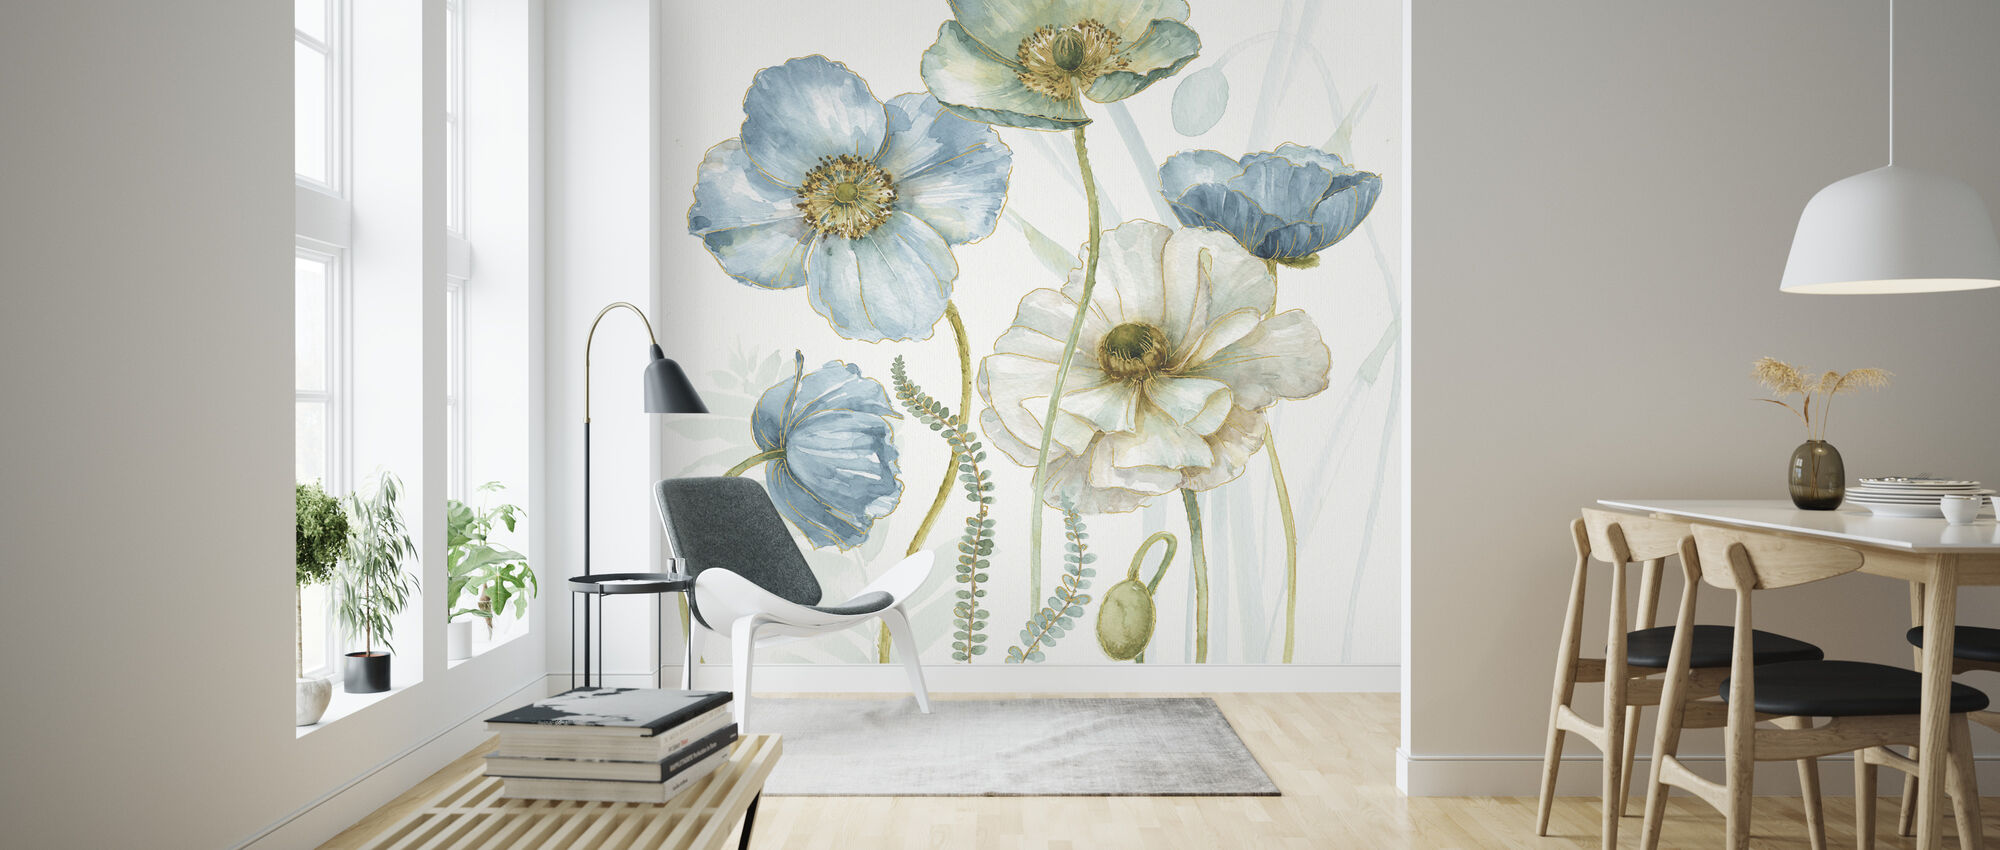 My Greenhouse Flowers 5 - Wallpaper - Living Room